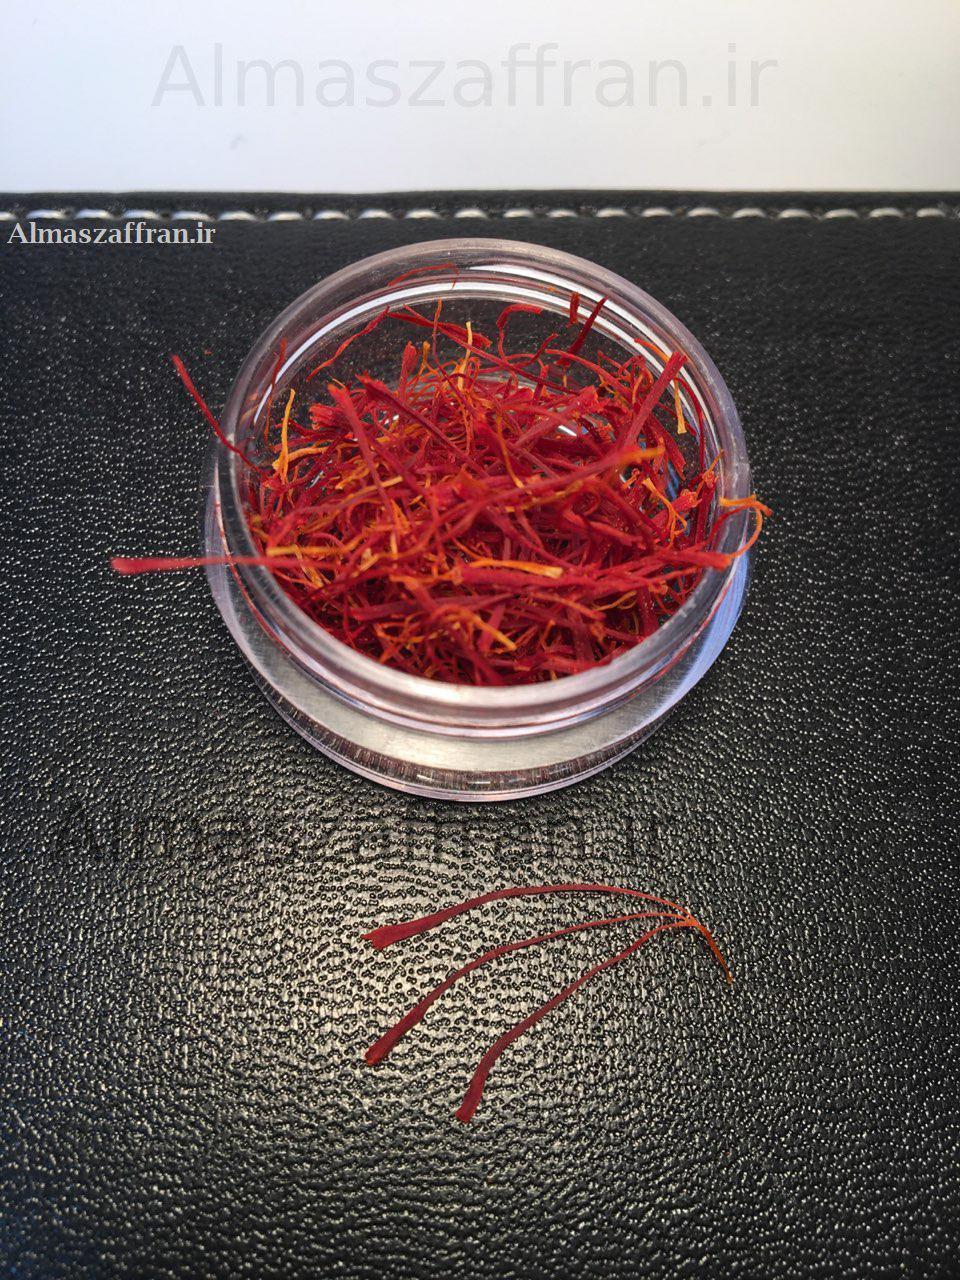 prices-of-saffron-in-china